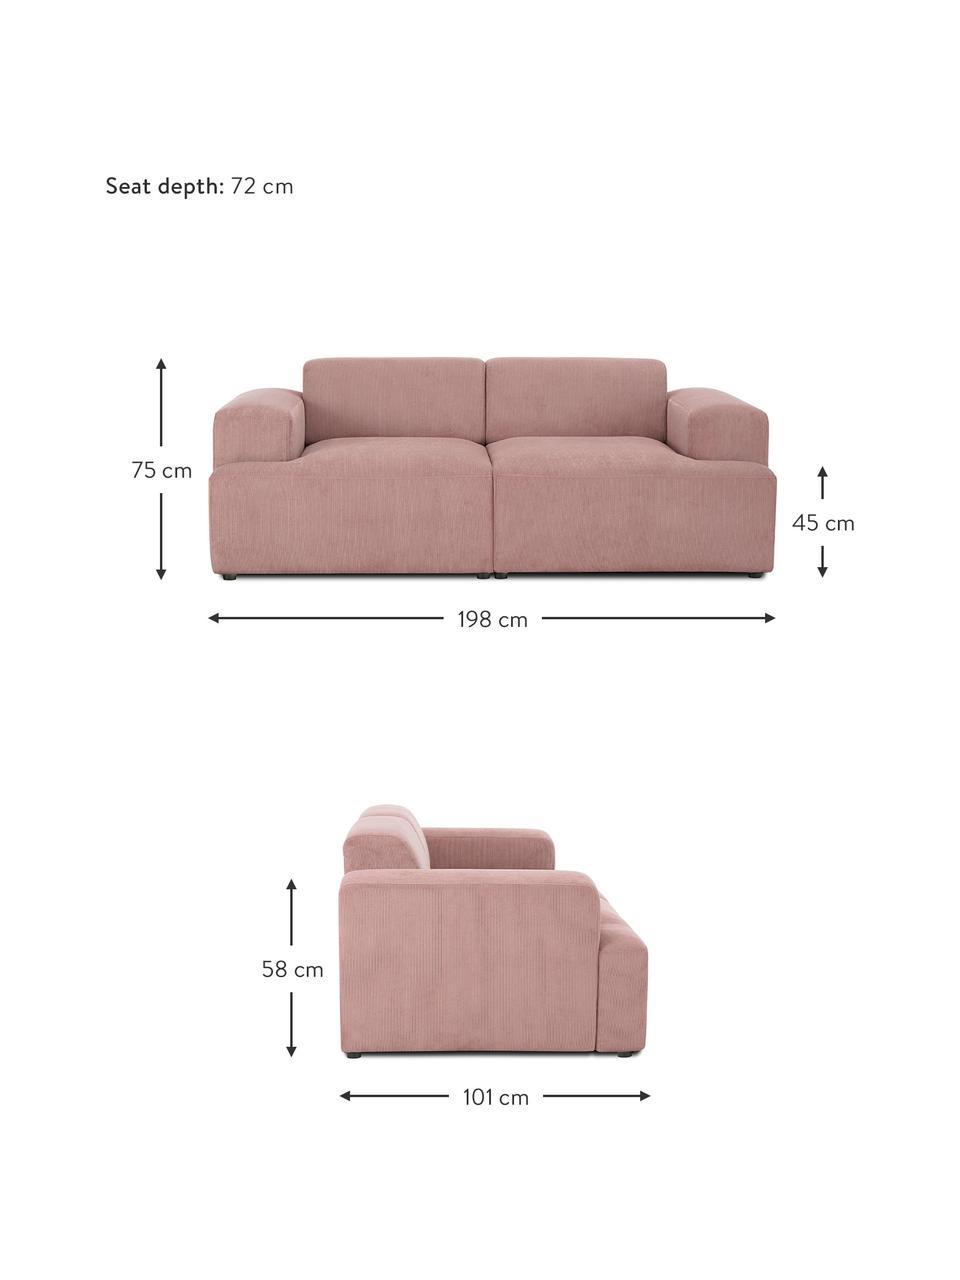 Cord-Sofa Melva (2-Sitzer) in Rosa, Bezug: Cord (92% Polyester, 8% P, Gestell: Massives Kiefernholz, FSC, Füße: Kunststoff, Cord Rosa, B 198 x T 101 cm